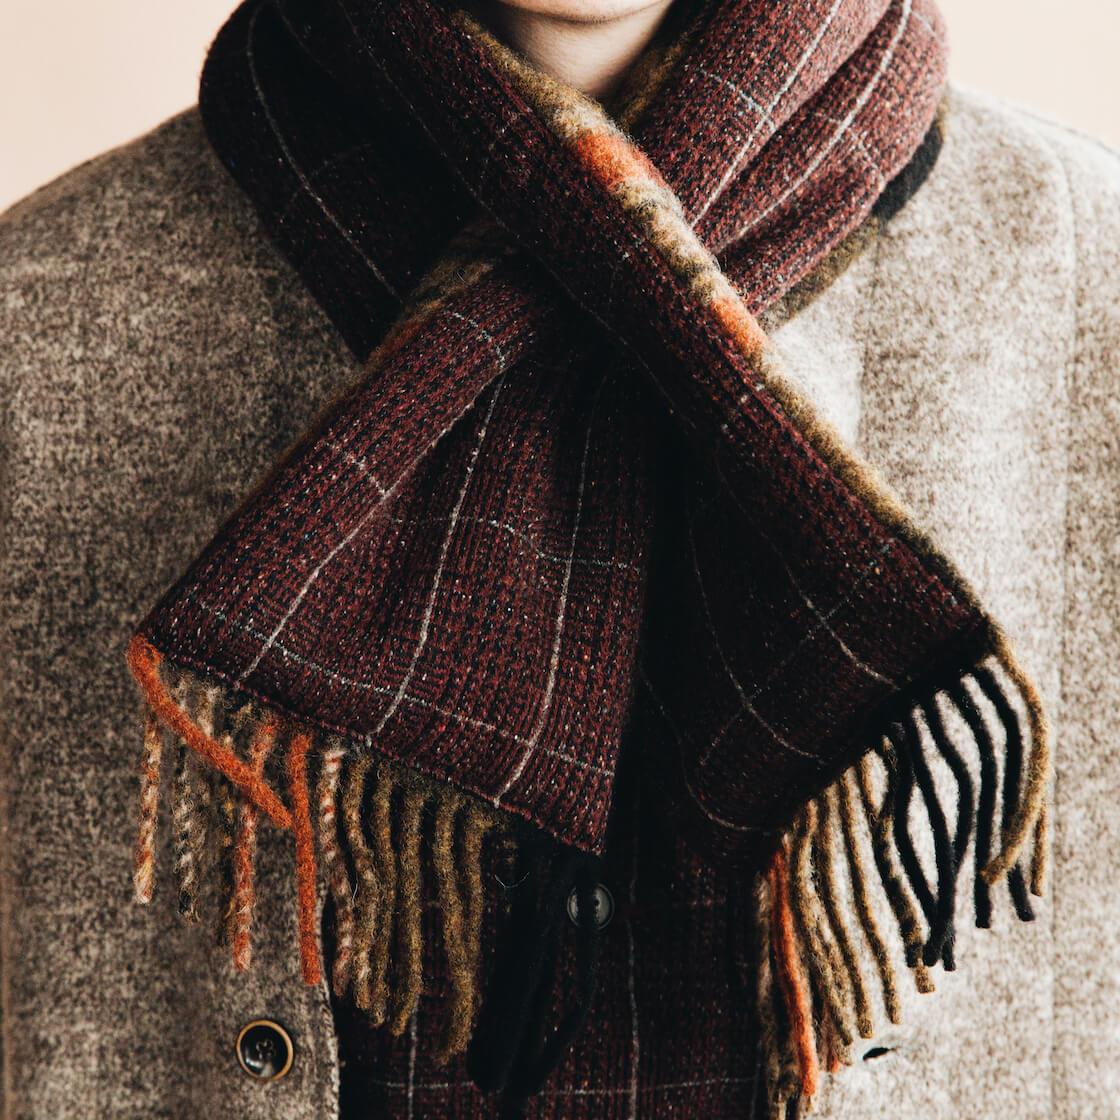 kapital tyrol wool nomad jacket, tweed fleecy knit kobe jacket, and country wool scarf on body